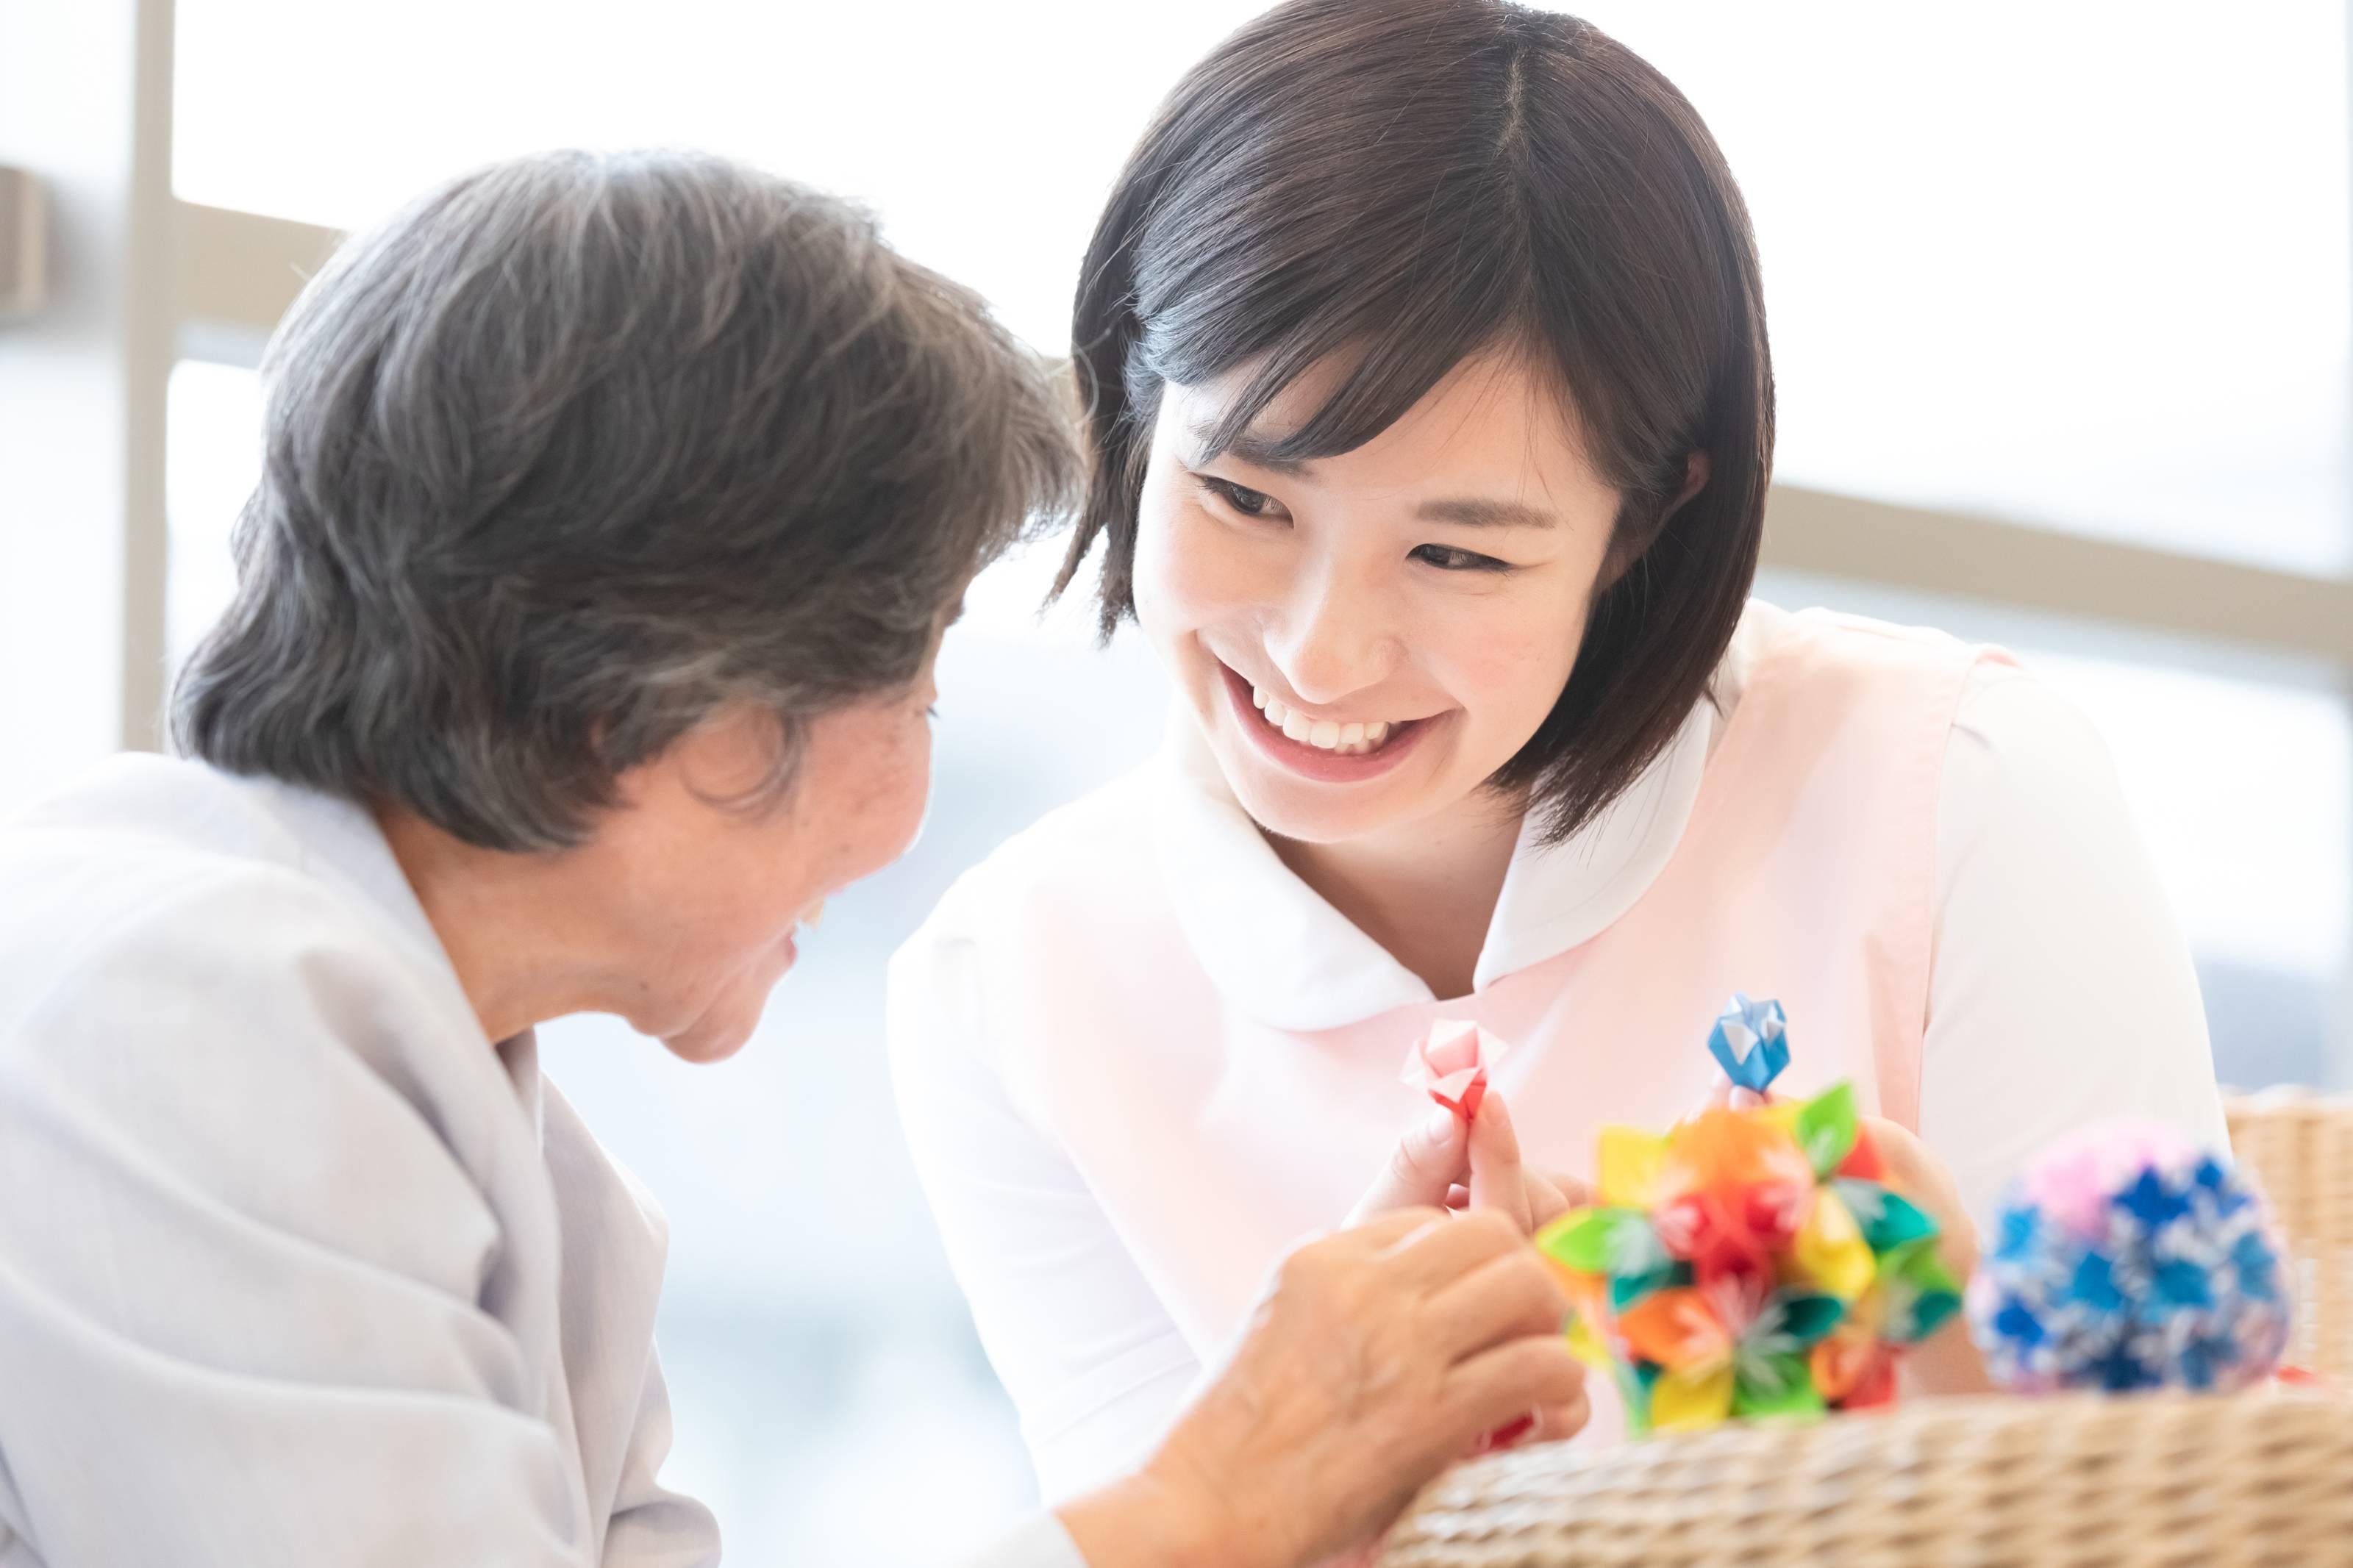 株式会社保健科学研究所 東京第1エリア